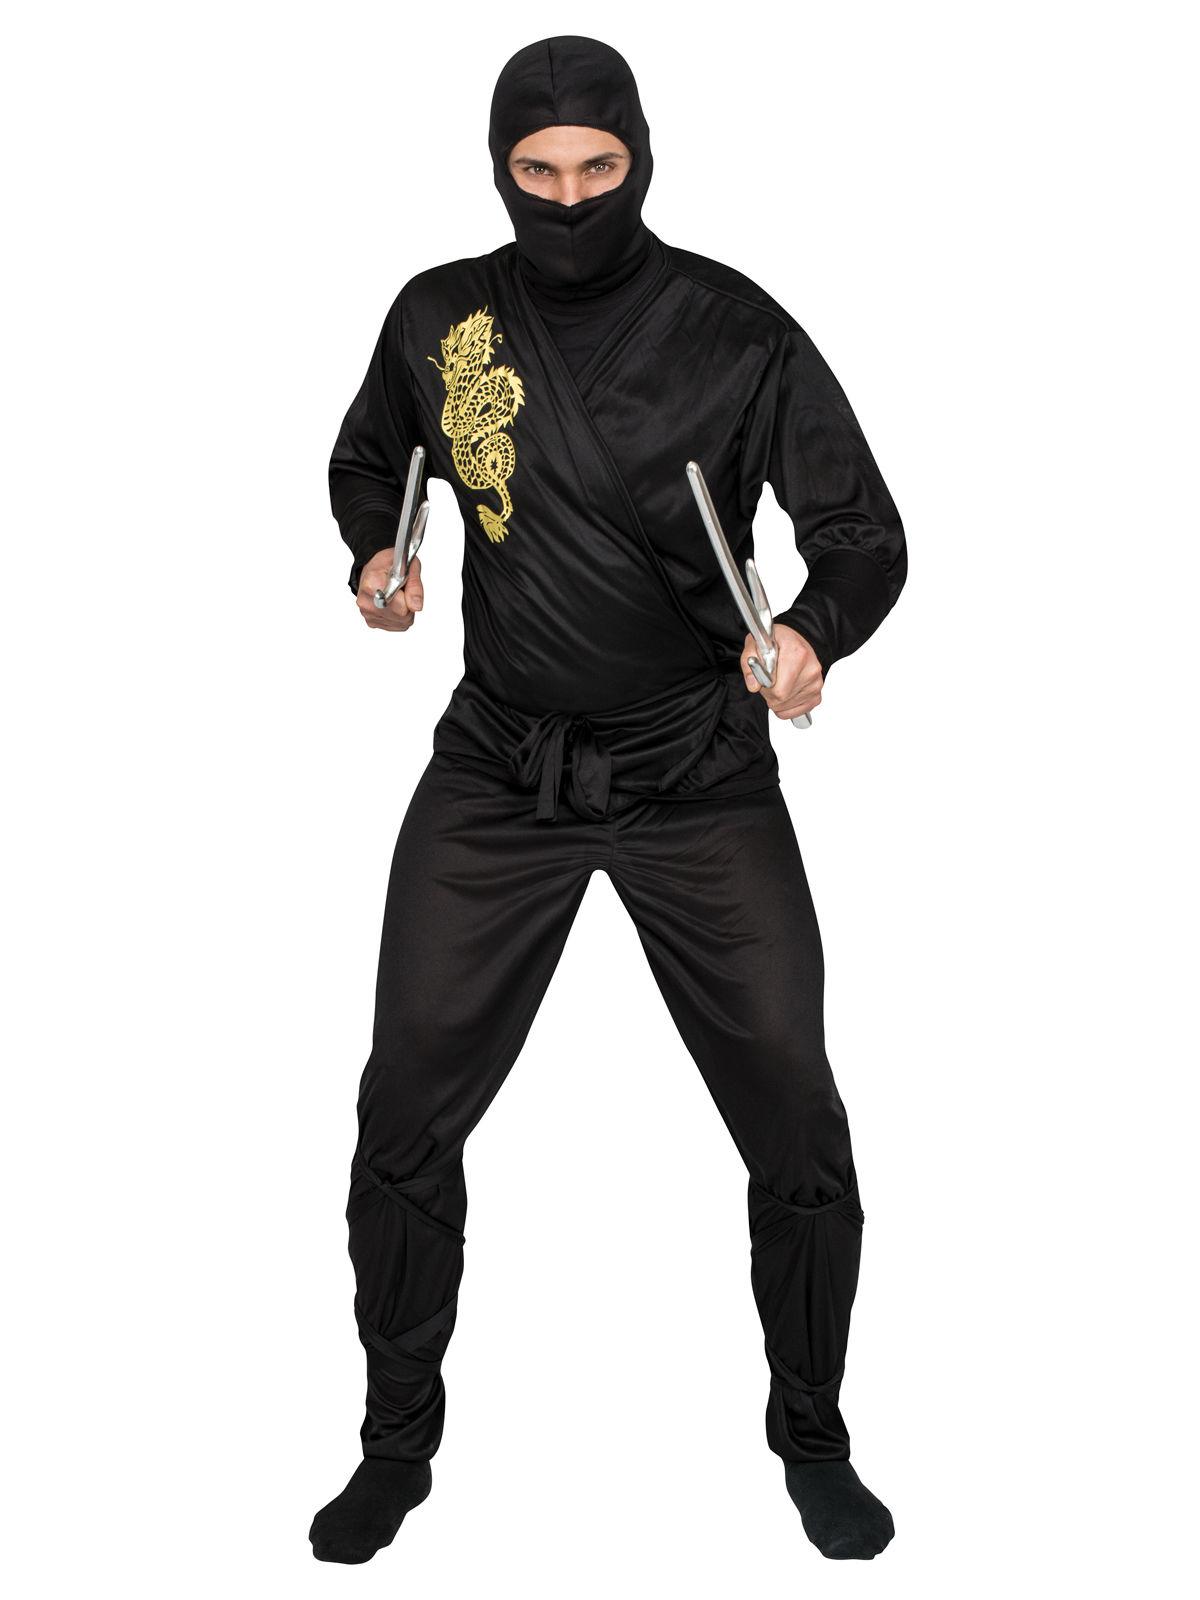 ninja kost m schwarz gelb g nstige faschings kost me bei karneval megastore. Black Bedroom Furniture Sets. Home Design Ideas